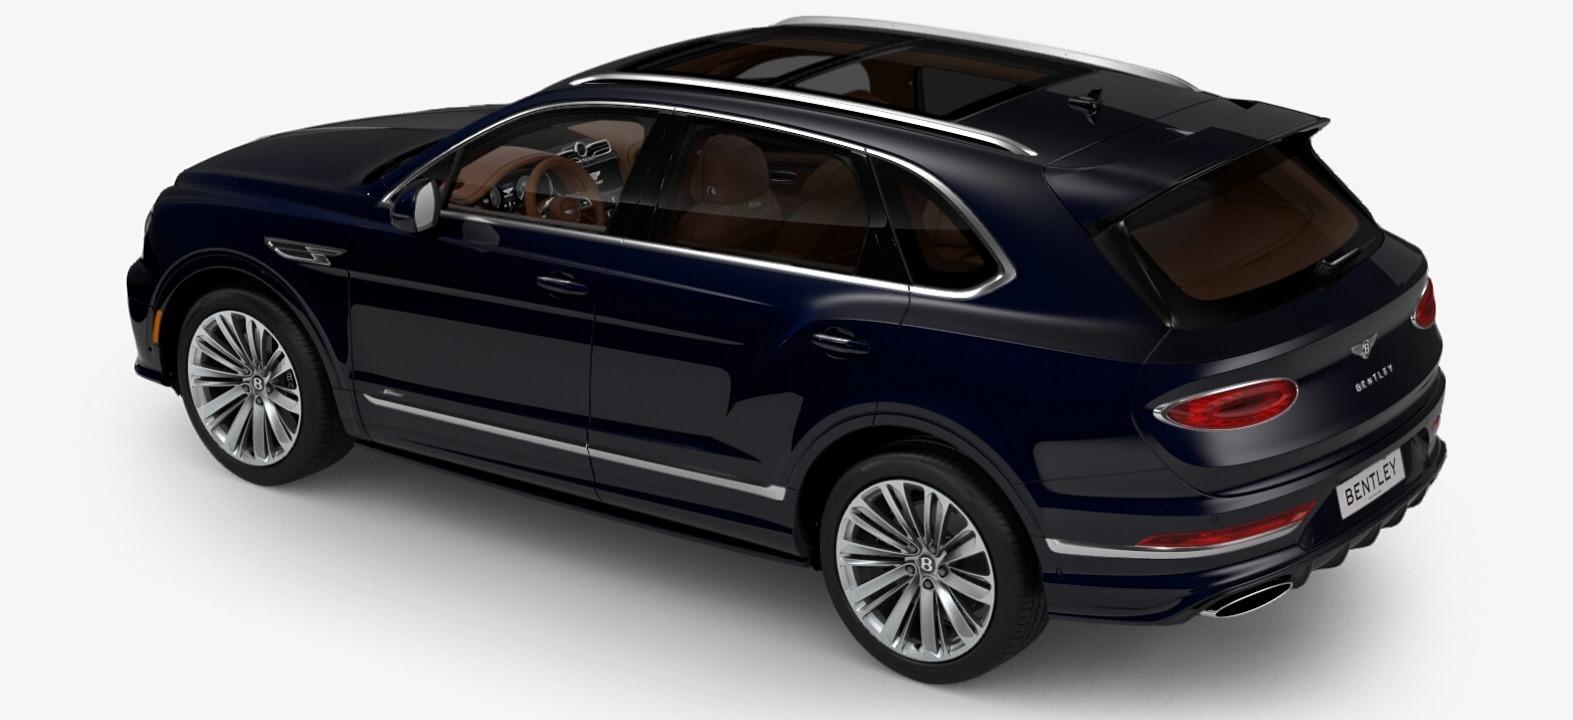 New-2021-Bentley-Bentayga-Speed-Edition